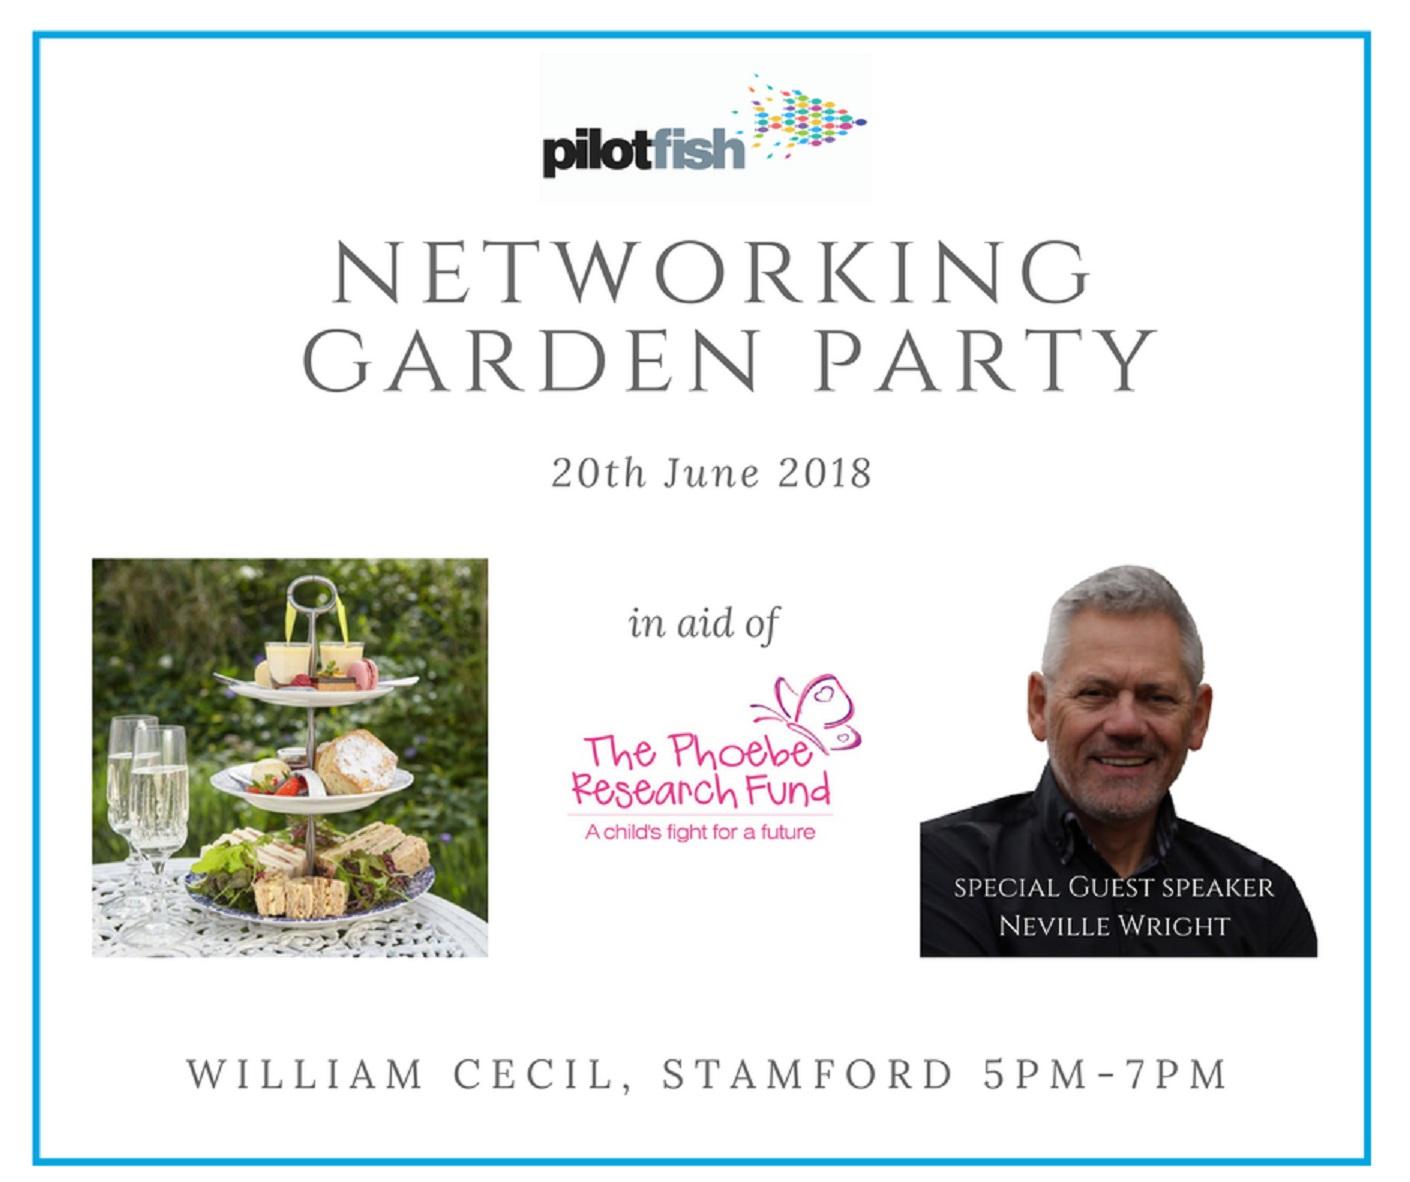 Pilot Fish Garden Party